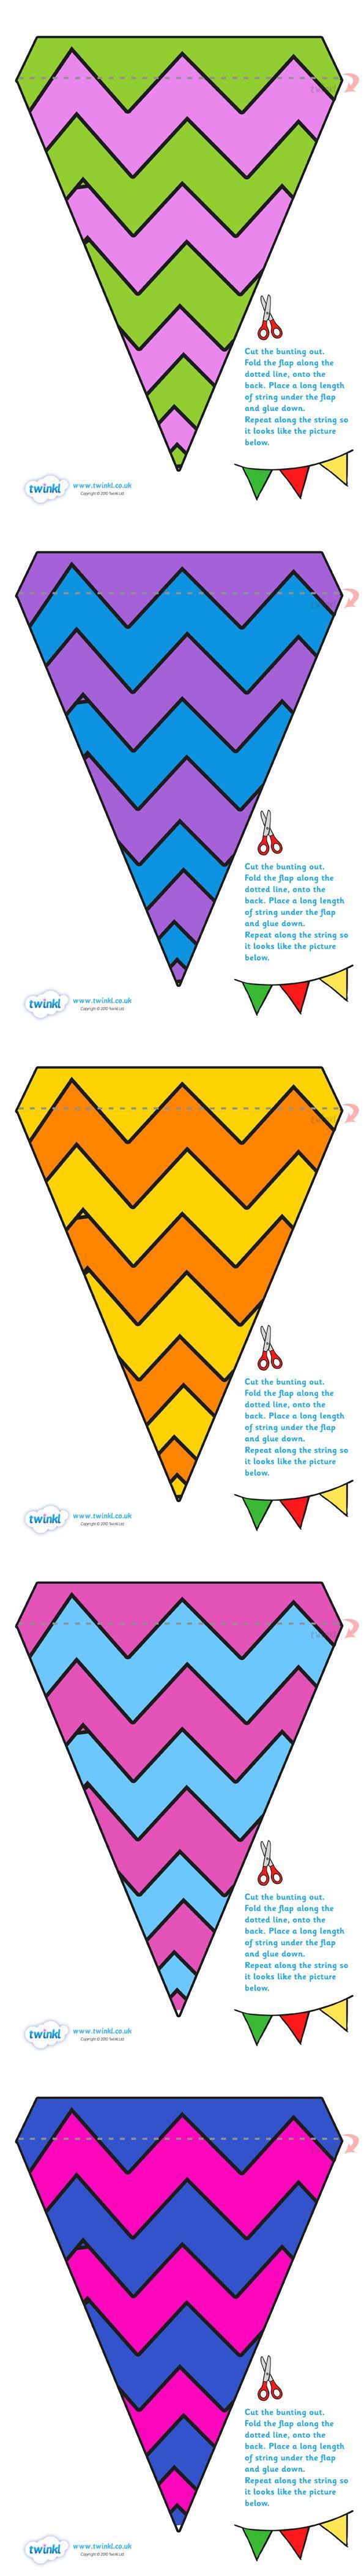 Twinkl Resources >> Display Bunting Zig Zags  >> Classroom printables for Pre-School, Kindergarten, Primary School and beyond! bunting, display bunting, classroom bunting, decorative bunting, classroom wedding, zig zags, patterened,